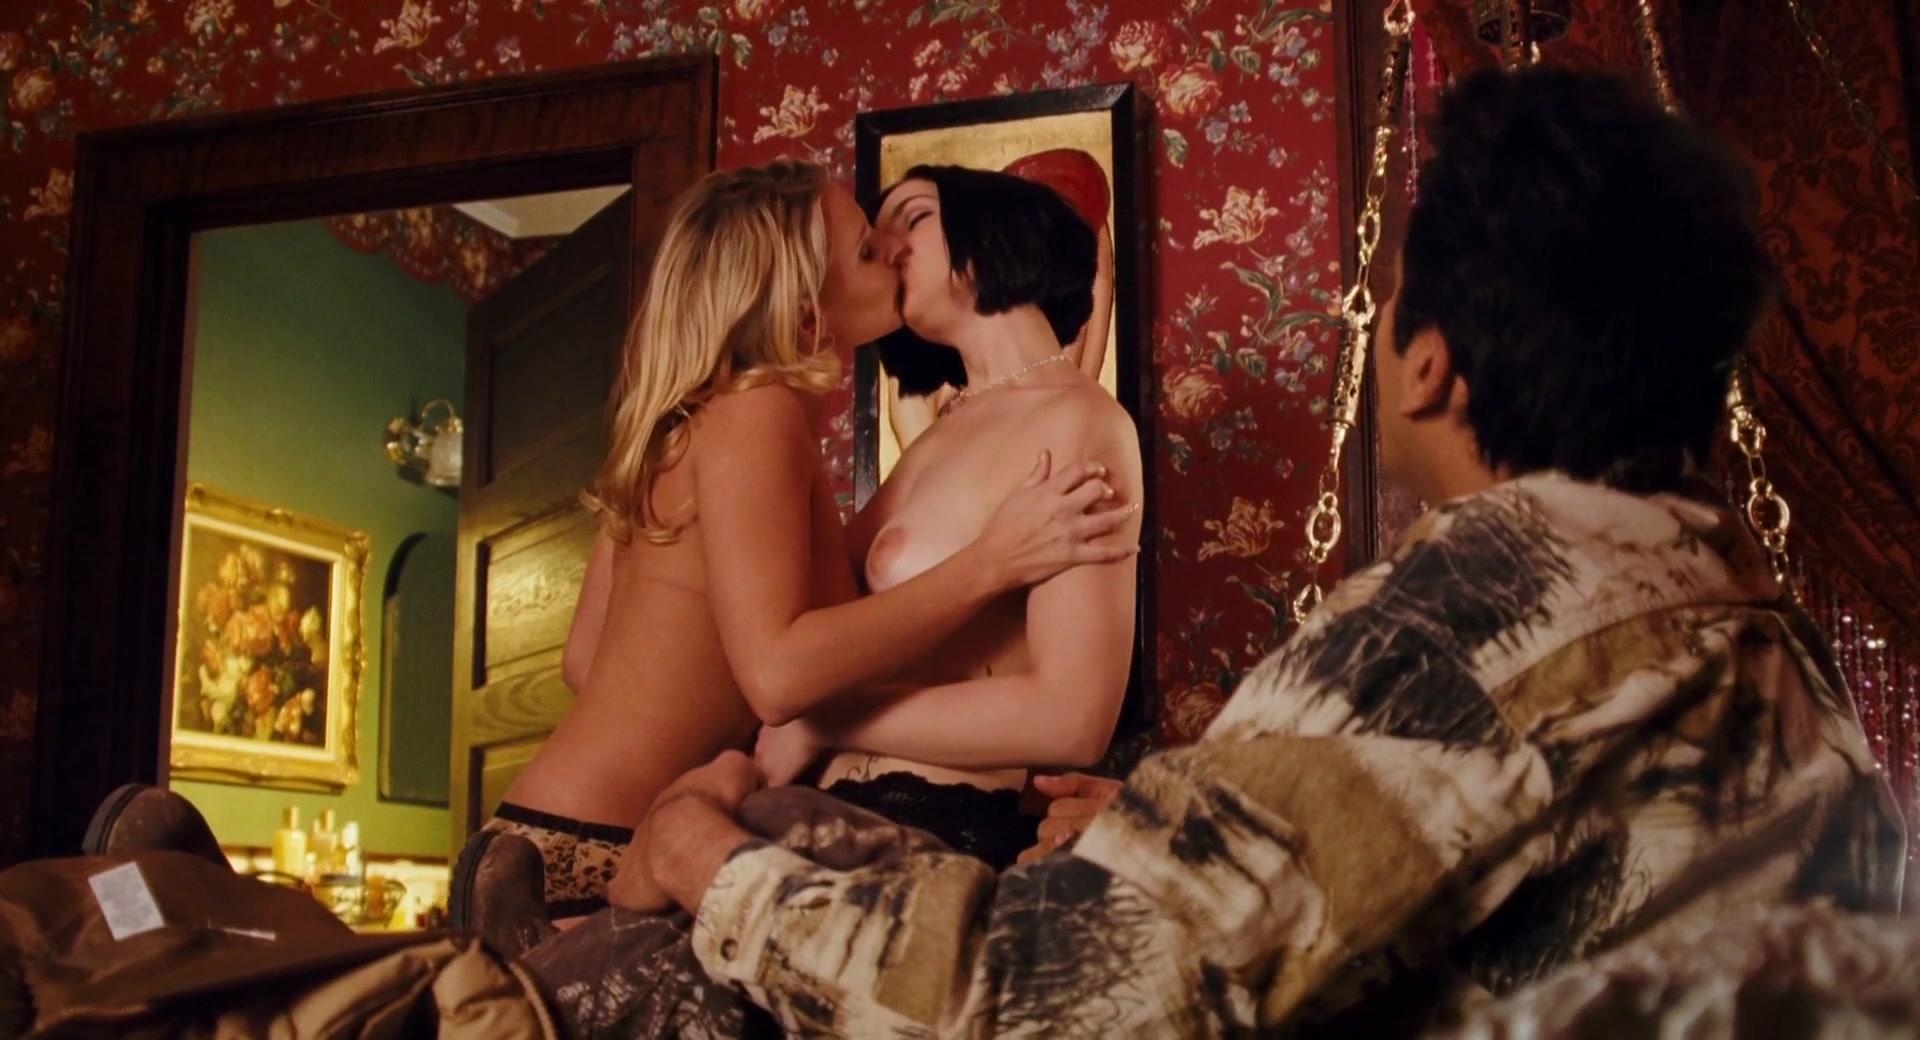 Amanda Santana Nude claudia pena, ava santana, beverly d'angelo nude - harold _